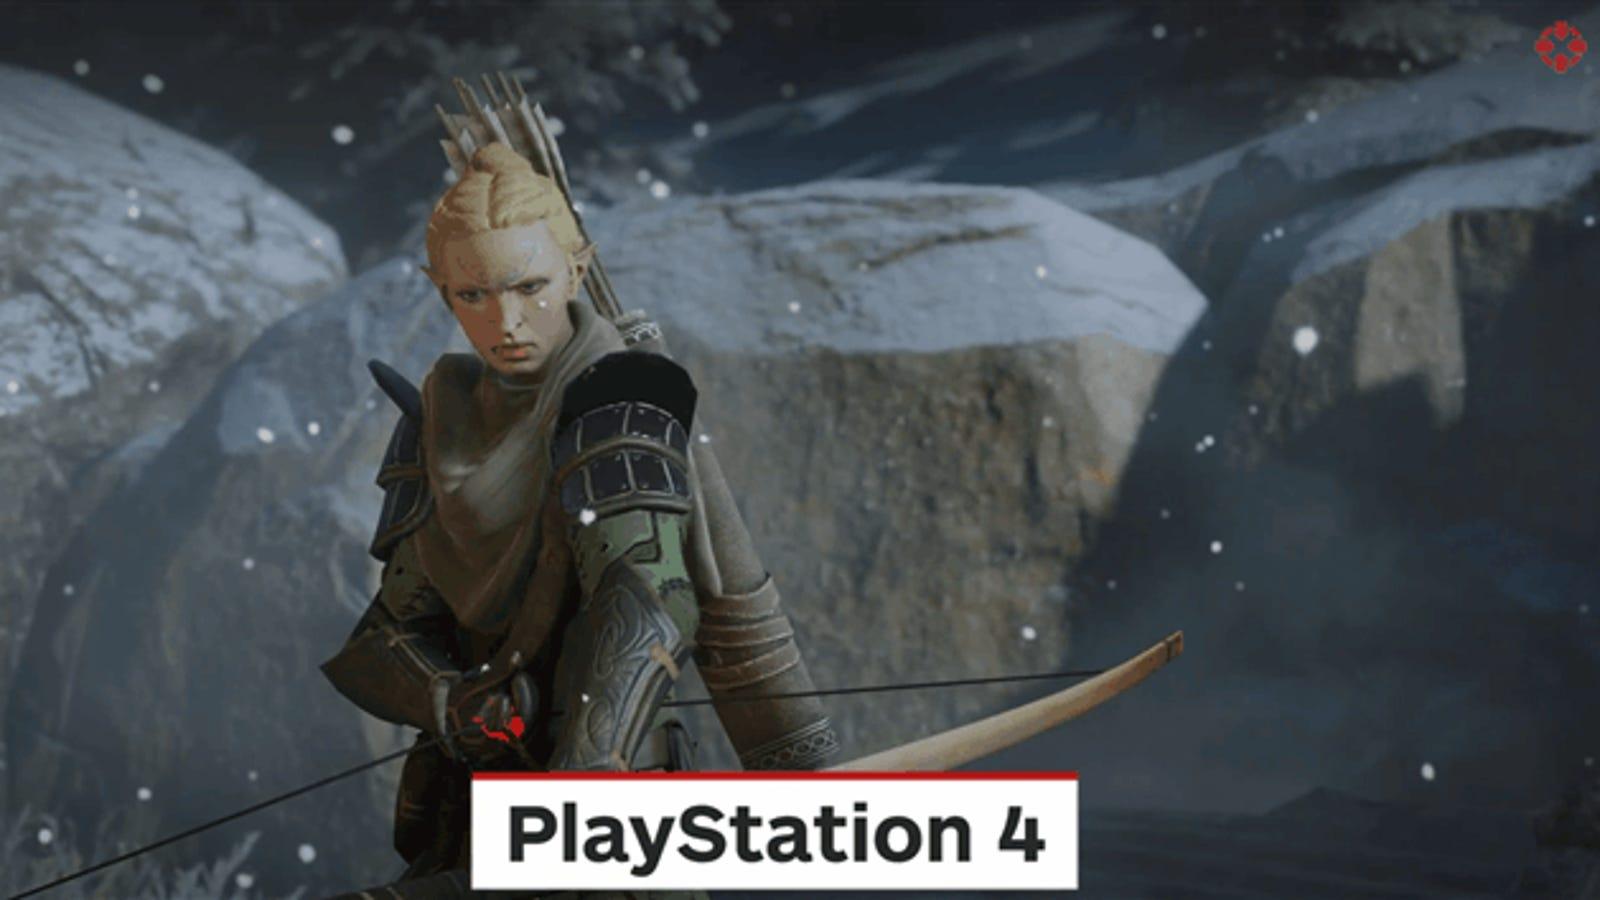 Dragon age inquisition on pc vs ps4 vs xbox one - Console dragon age inquisition ...